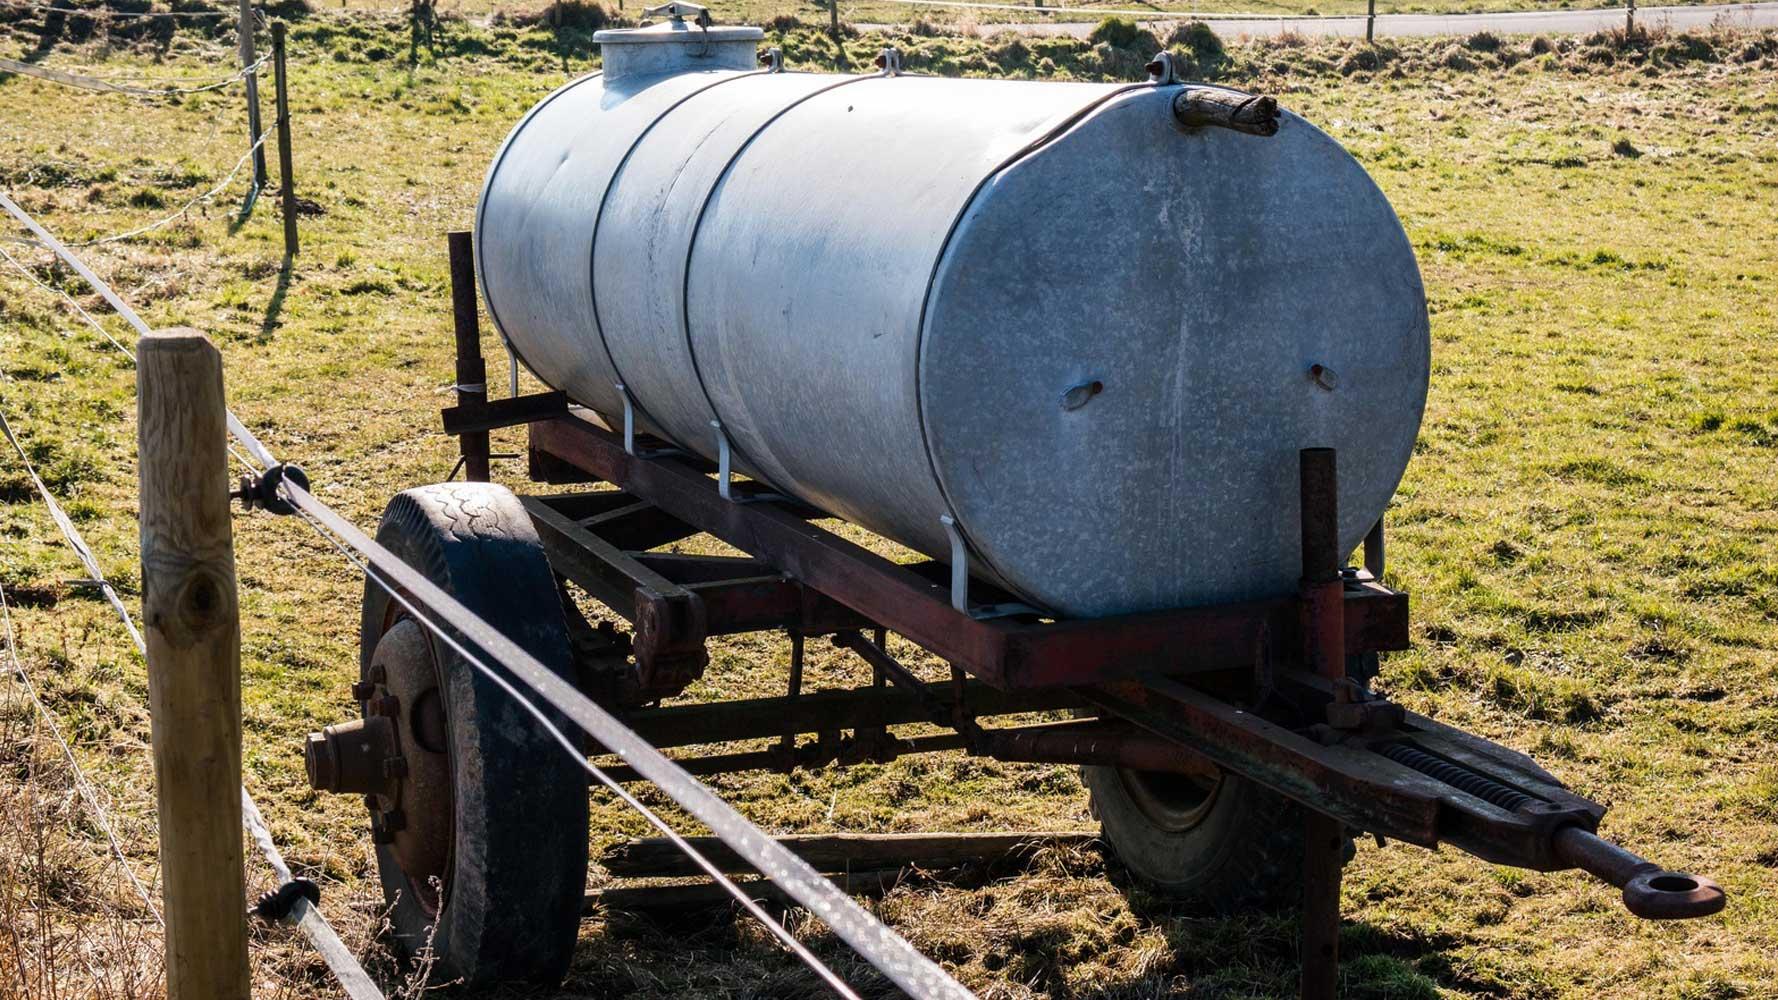 Su Tankeri fiyatları,Su Tankeri piyasası, Su Tankeri resmi